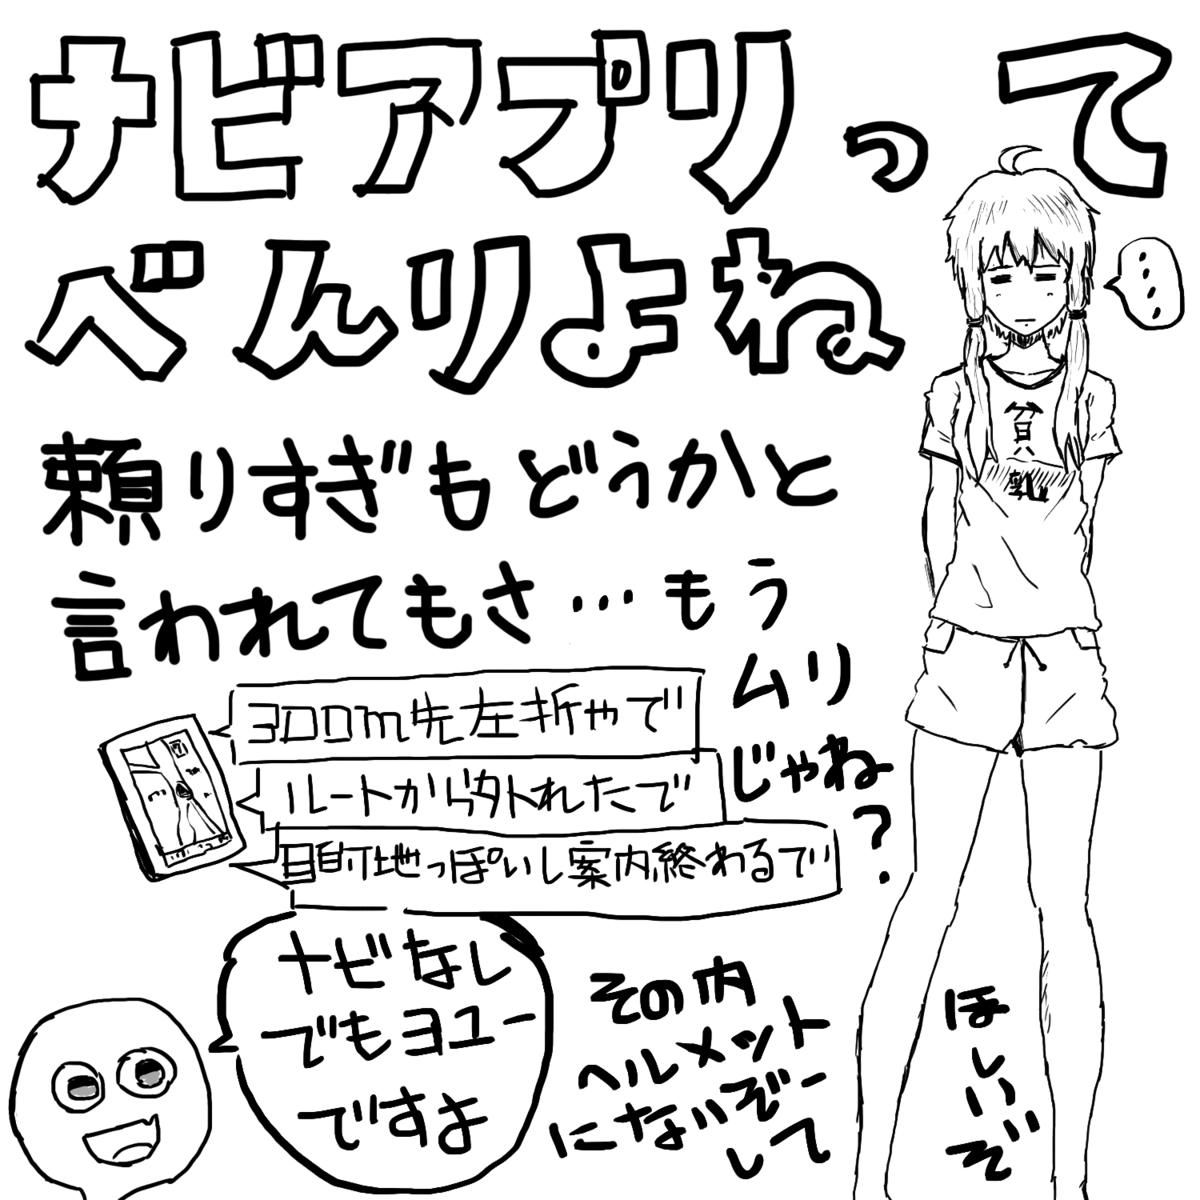 f:id:zomuzomu:20200305103307p:plain